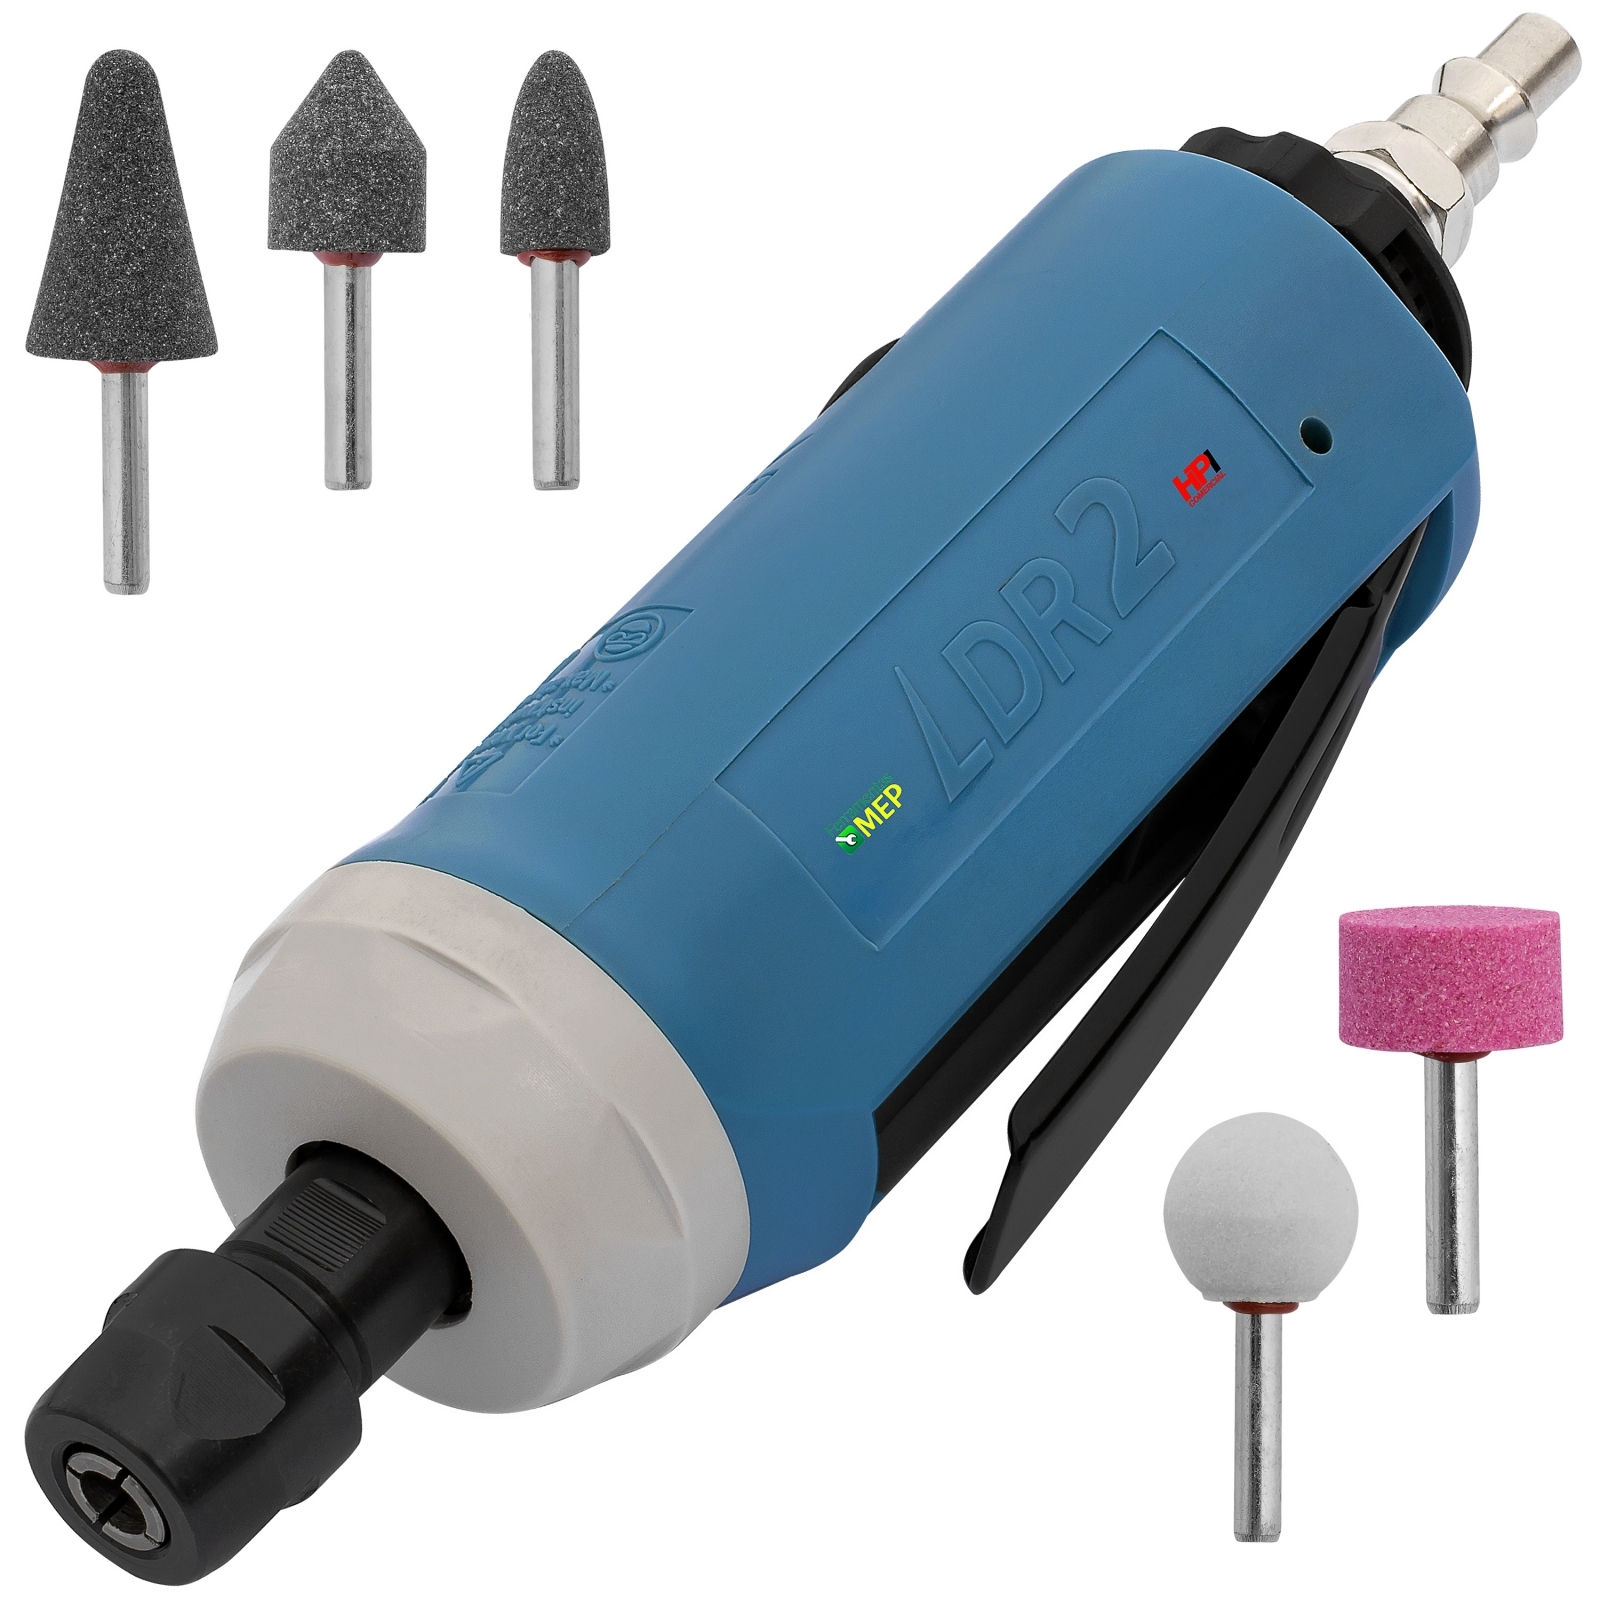 Retífica Pneumática Industrial LDR DR3-4875 - Ferramentas MEP